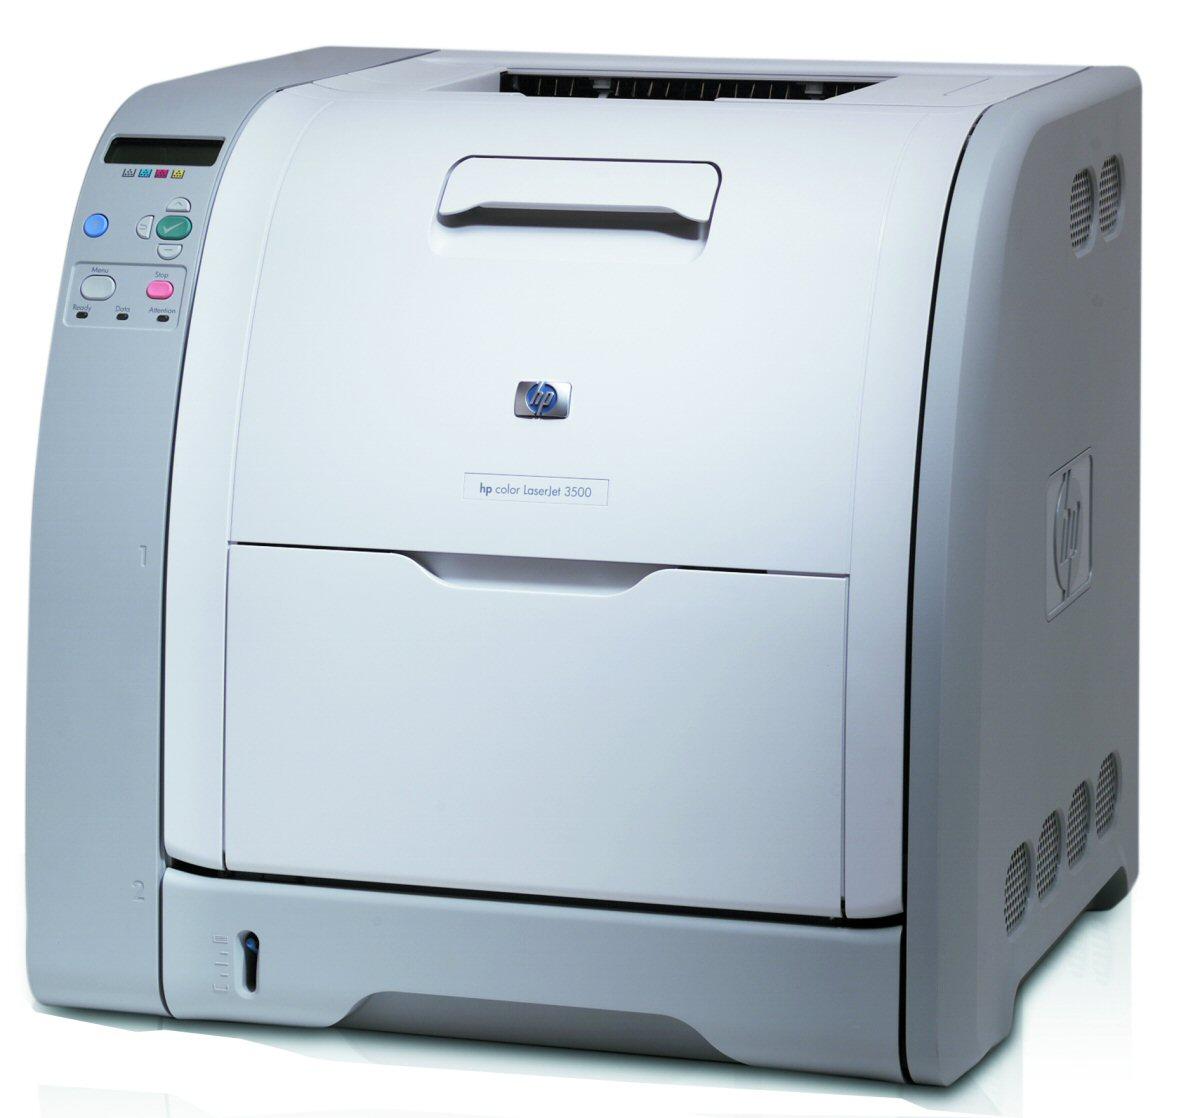 HP 3500N Color Laserjet Printer RECONDITIONED